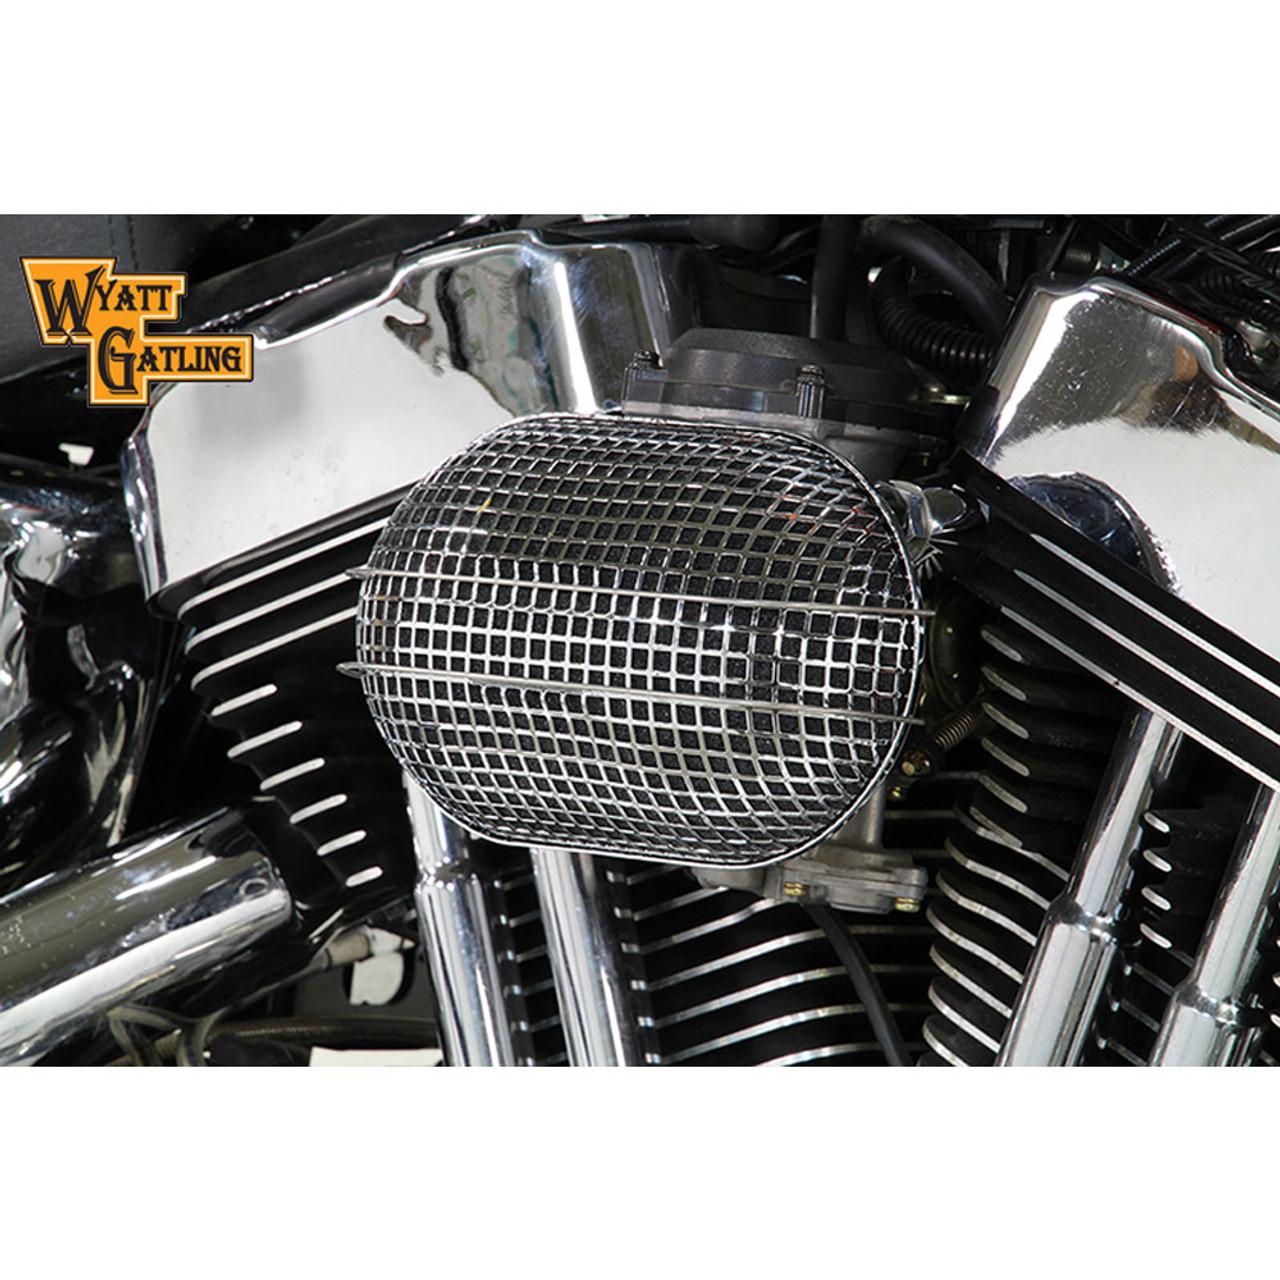 Wyatt Gatling Inverted Air Filter Kit,for Harley Davidson,by V-Twin